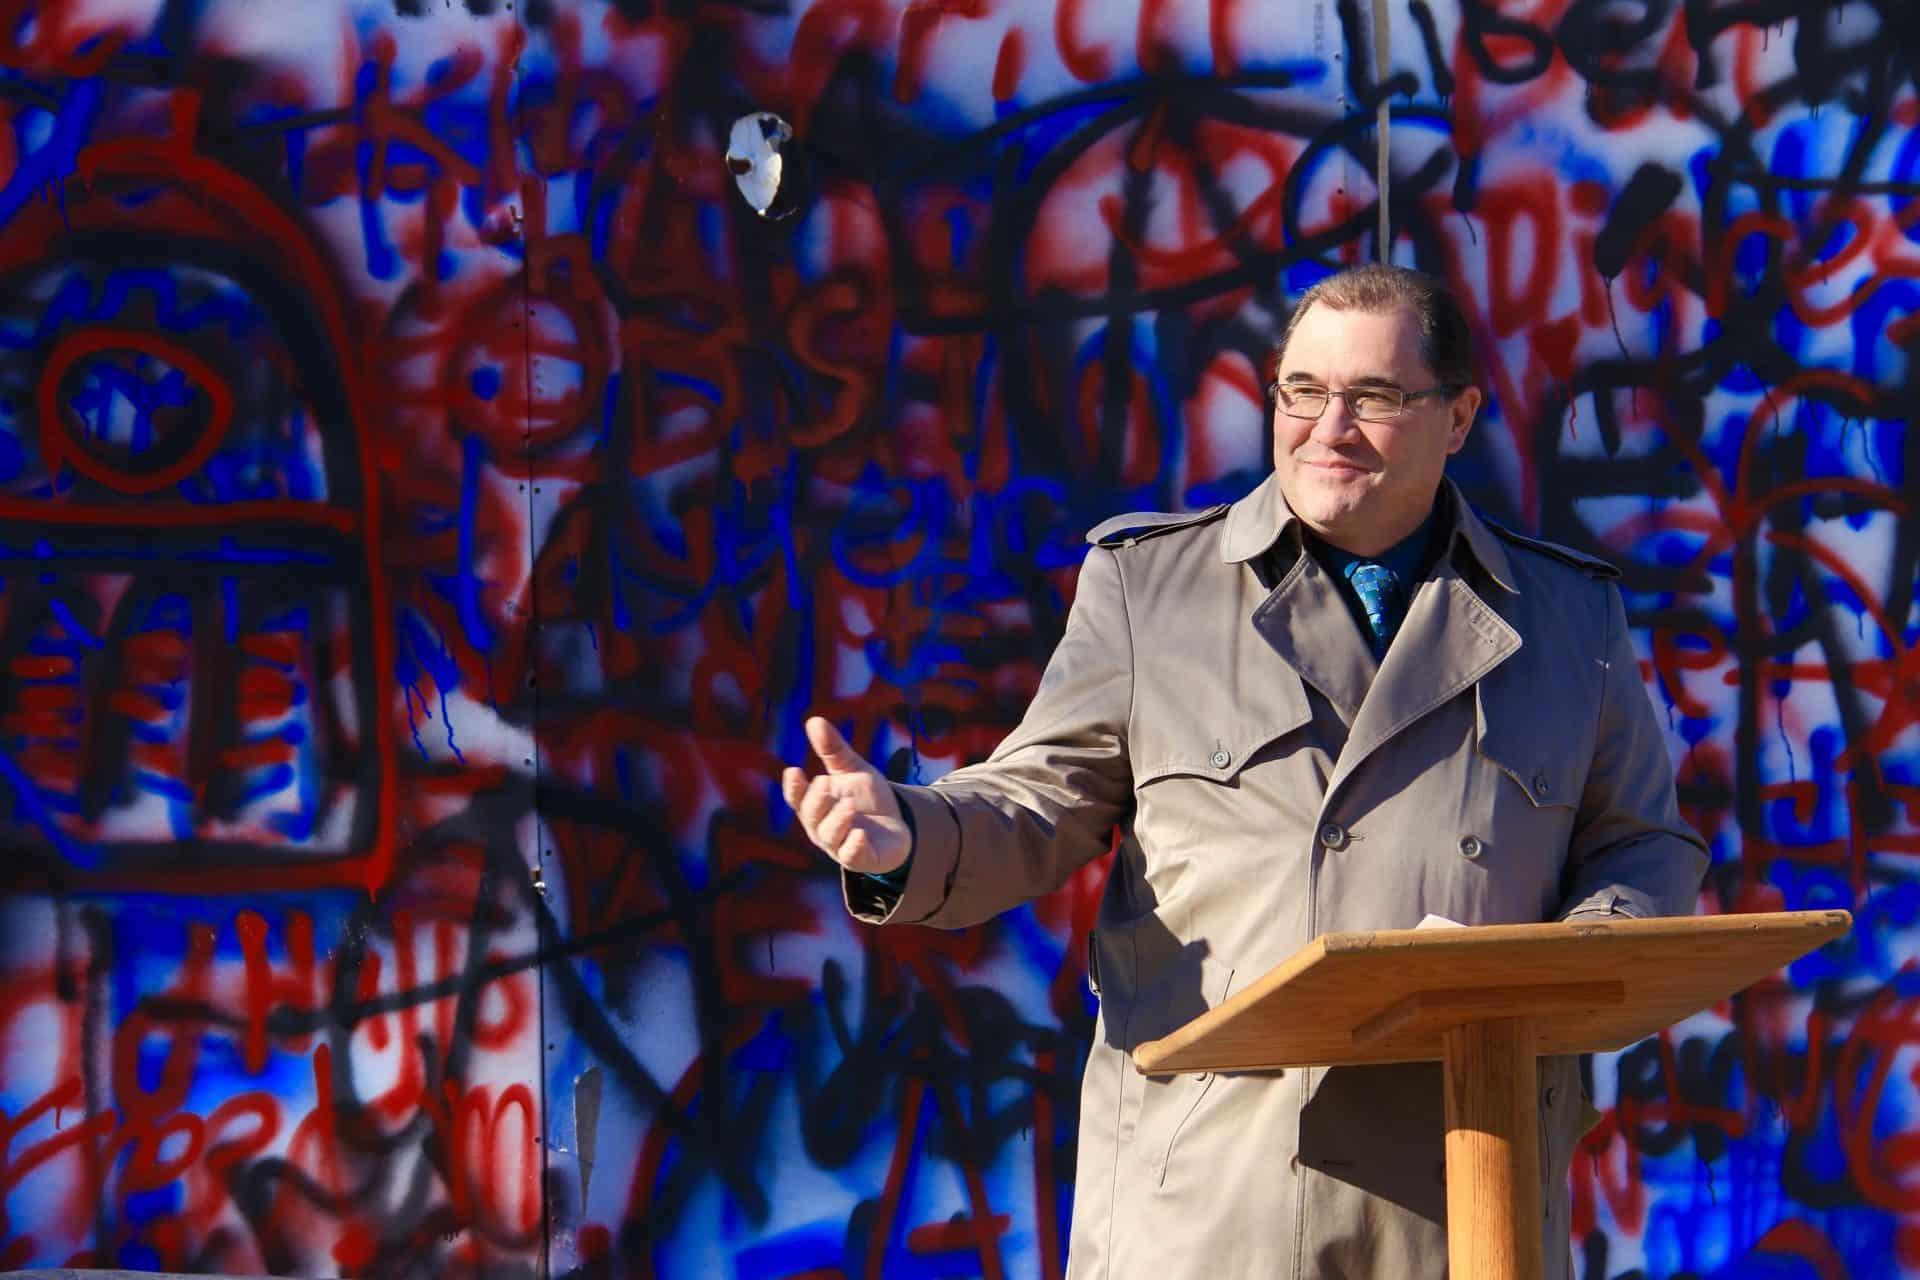 Yaniga at fake Berlin Wall